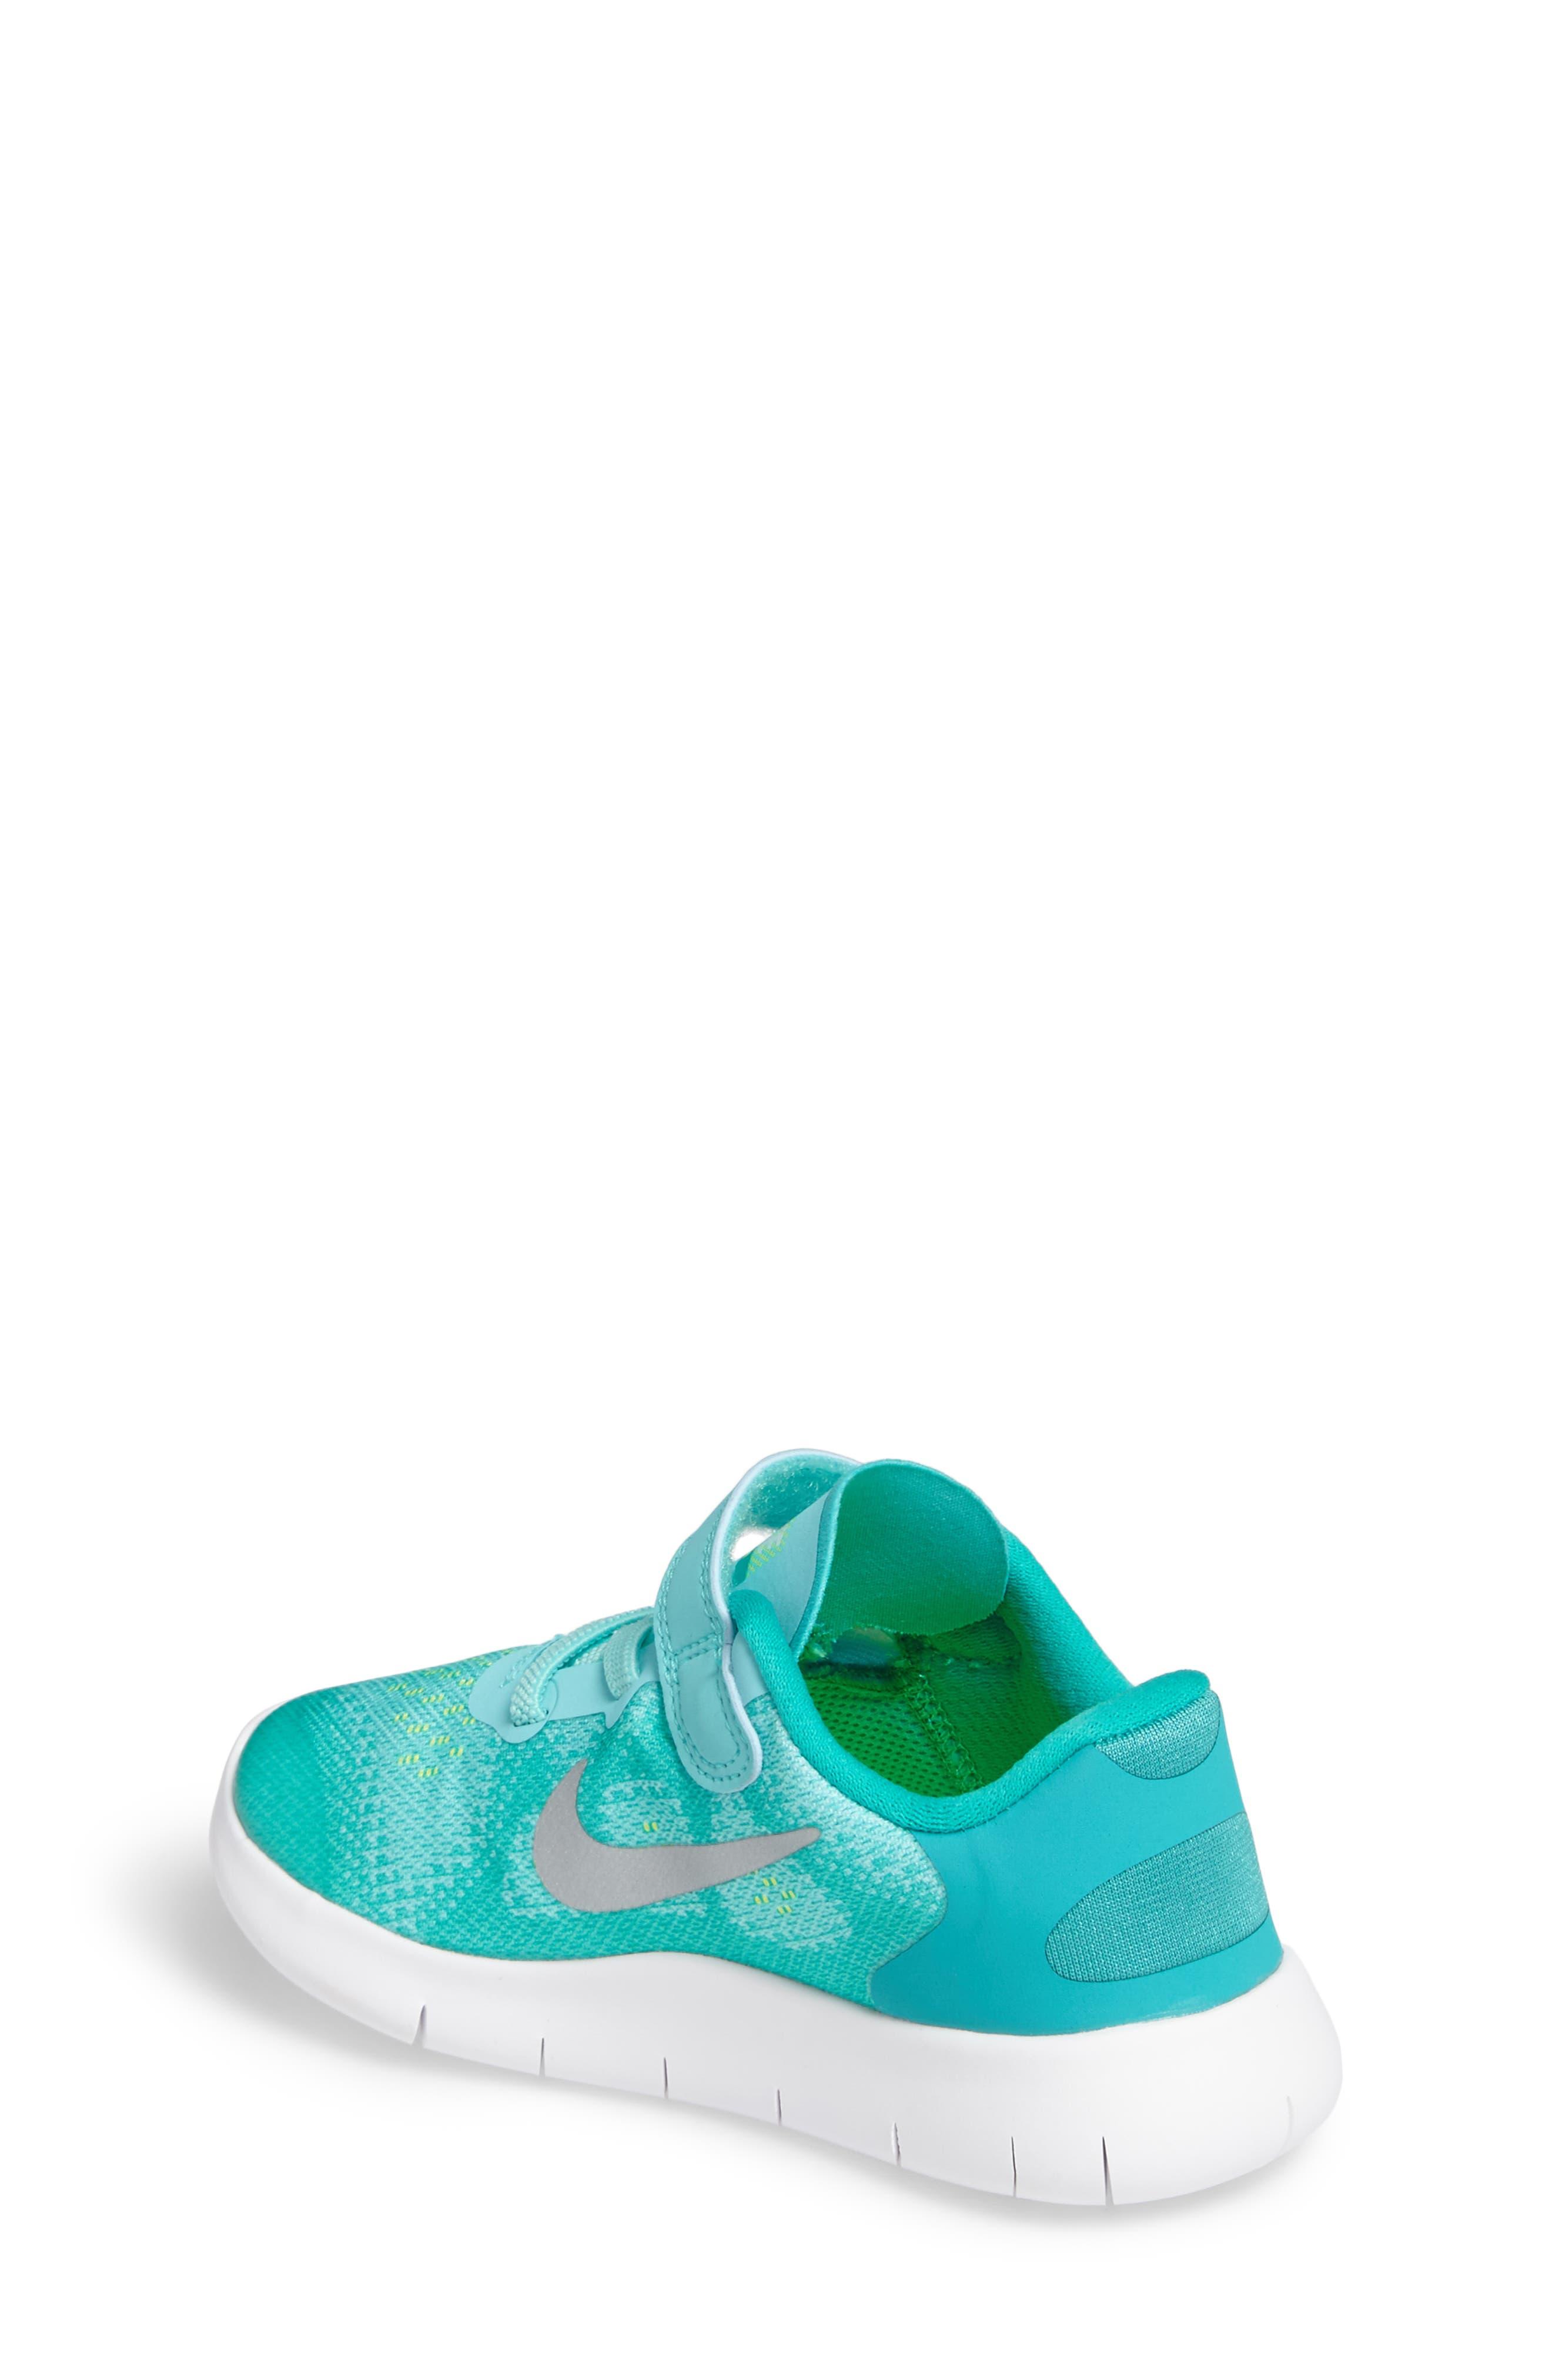 Free Run 2017 Sneaker,                             Alternate thumbnail 8, color,